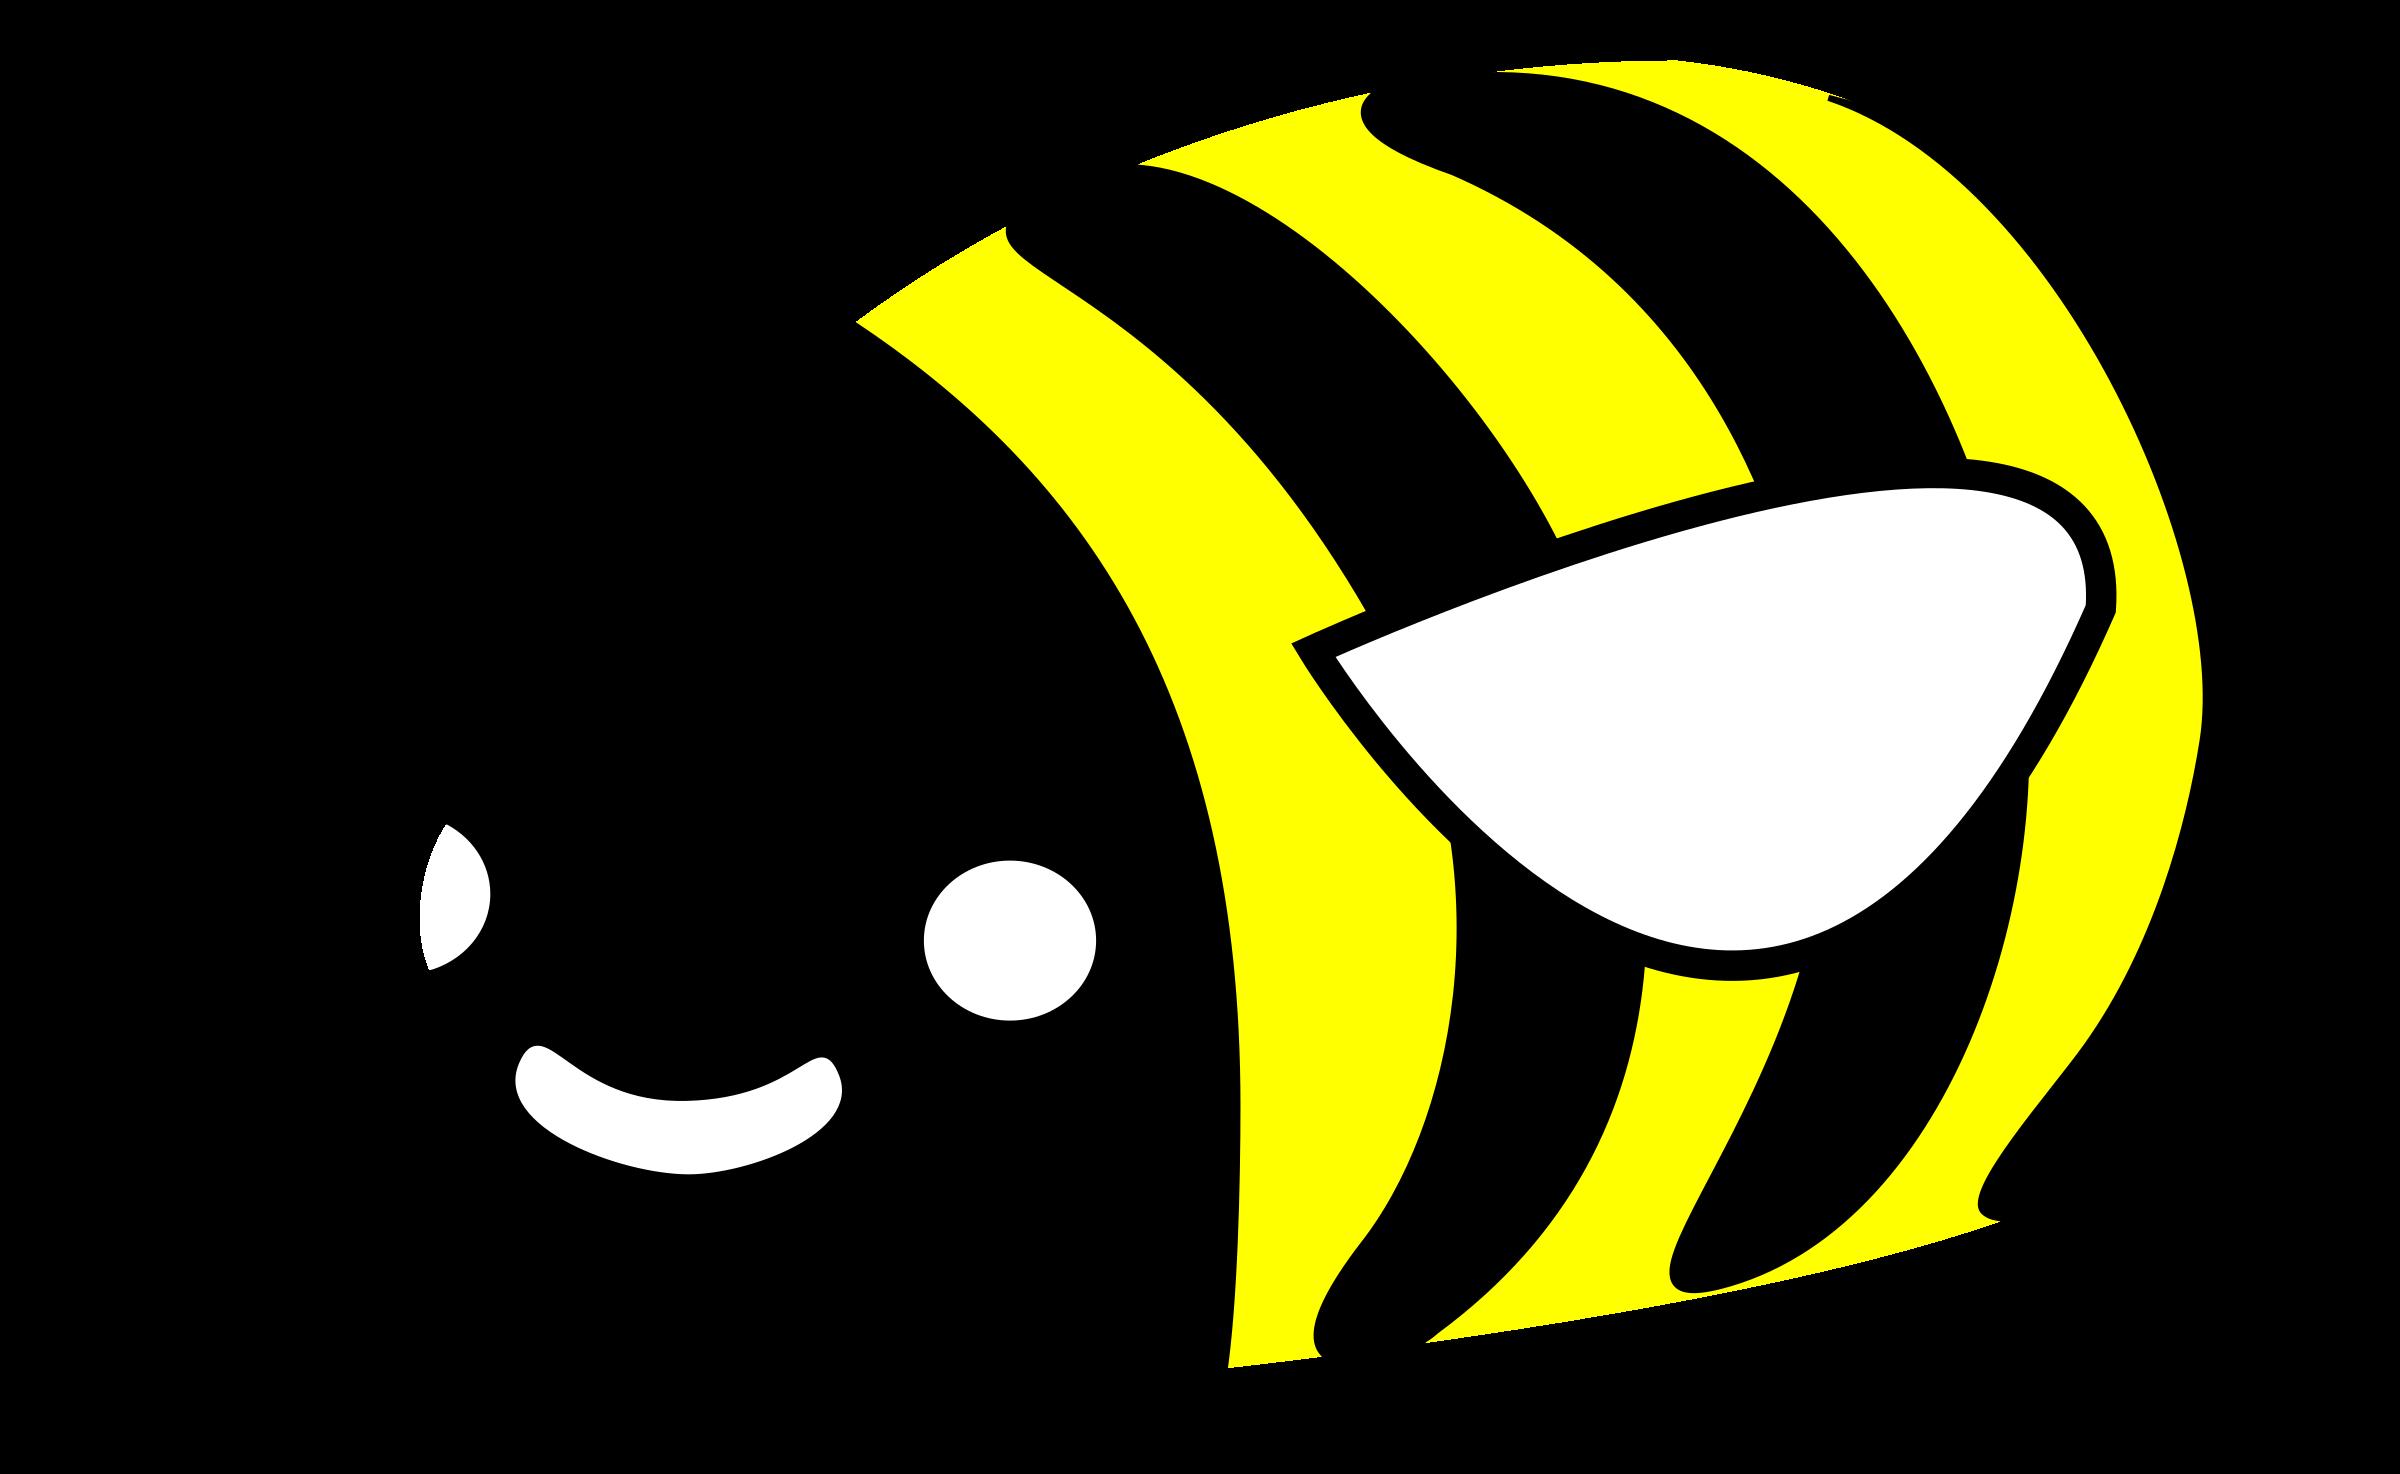 Cute bumble big image. Kawaii clipart bee